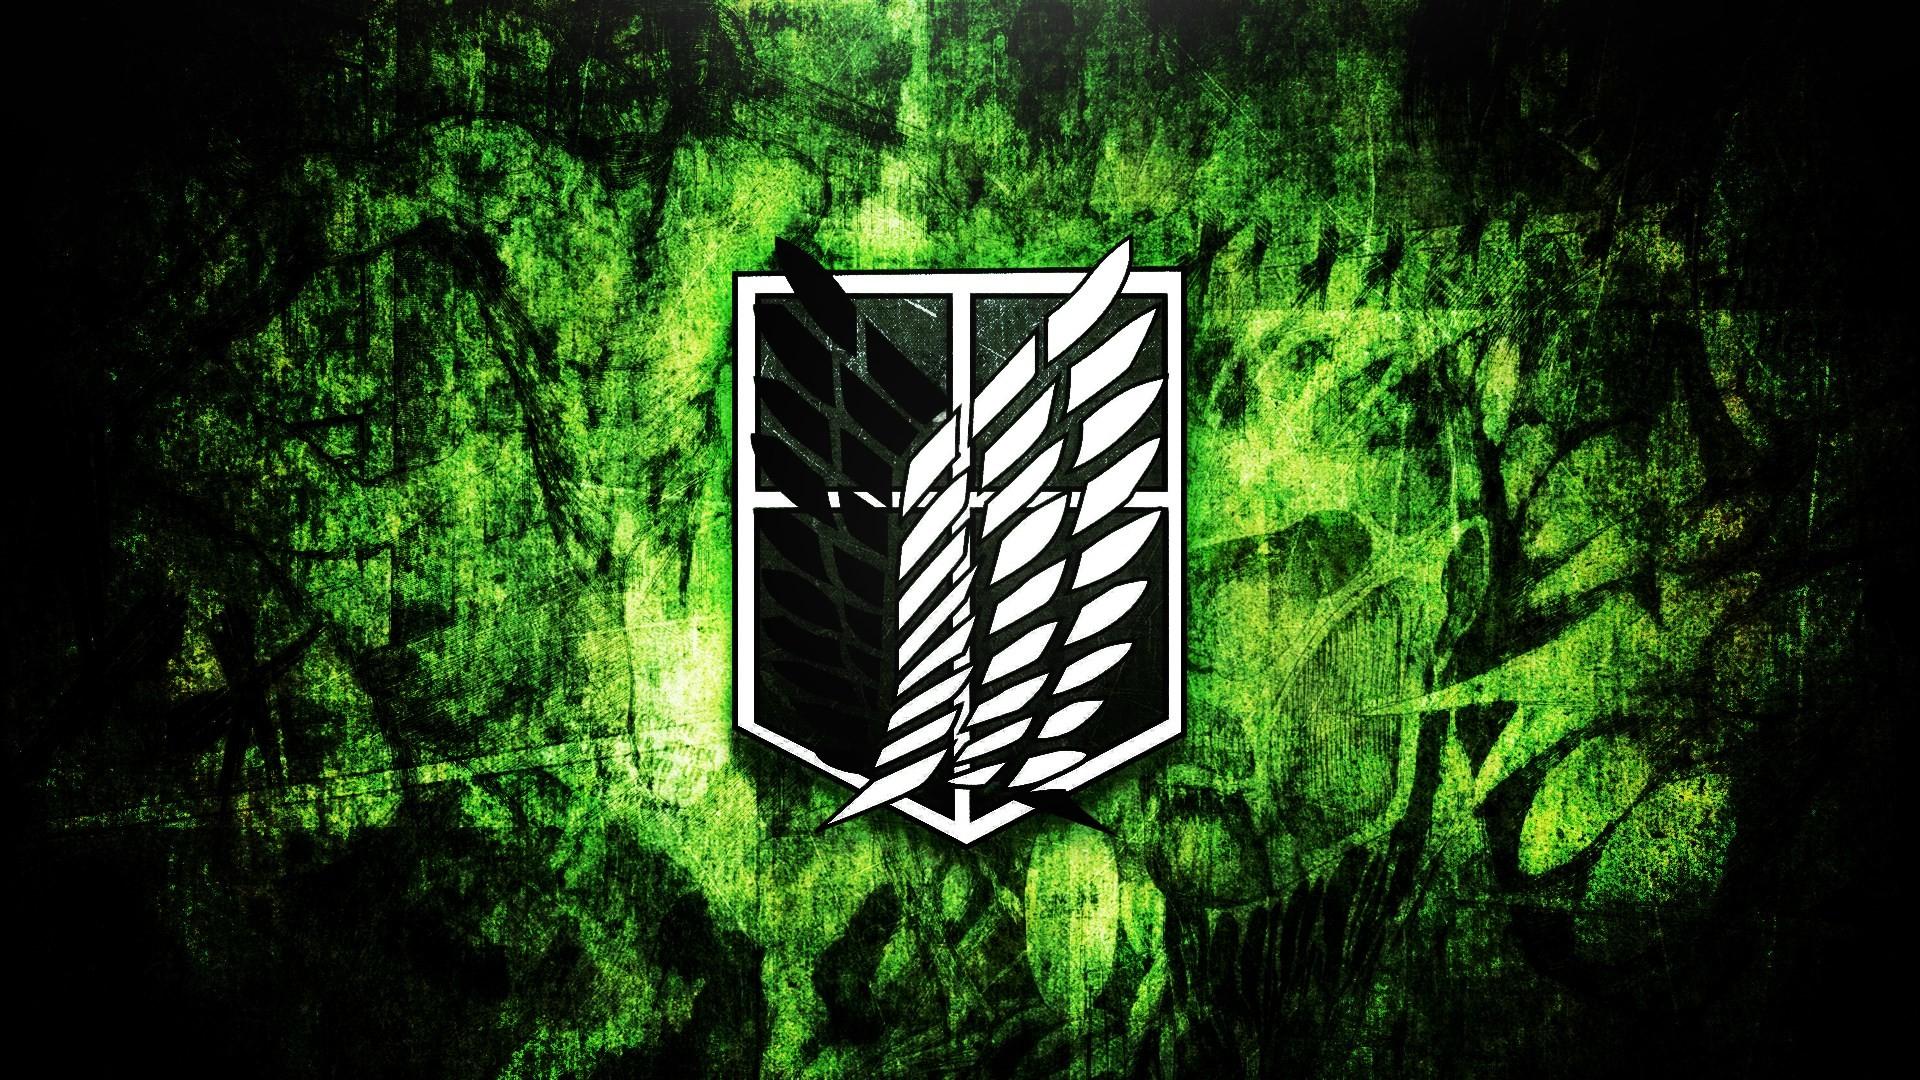 Attack on Titan Logo Wallpaper (73+ images)